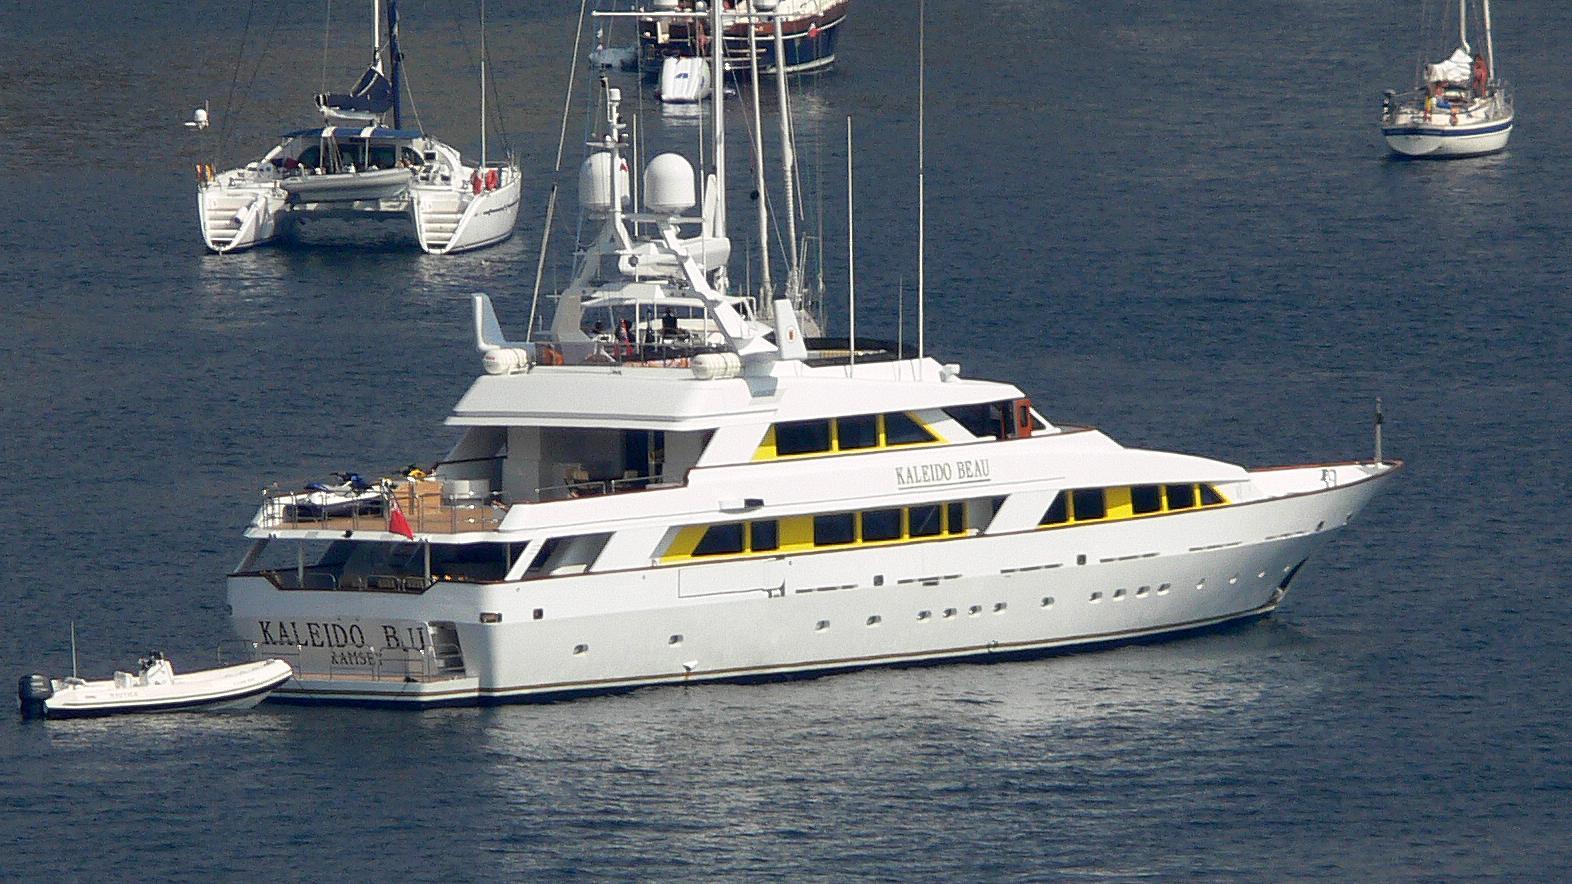 mistress-motor-yacht-benetti-45m-1990-46m-moored-half-profile